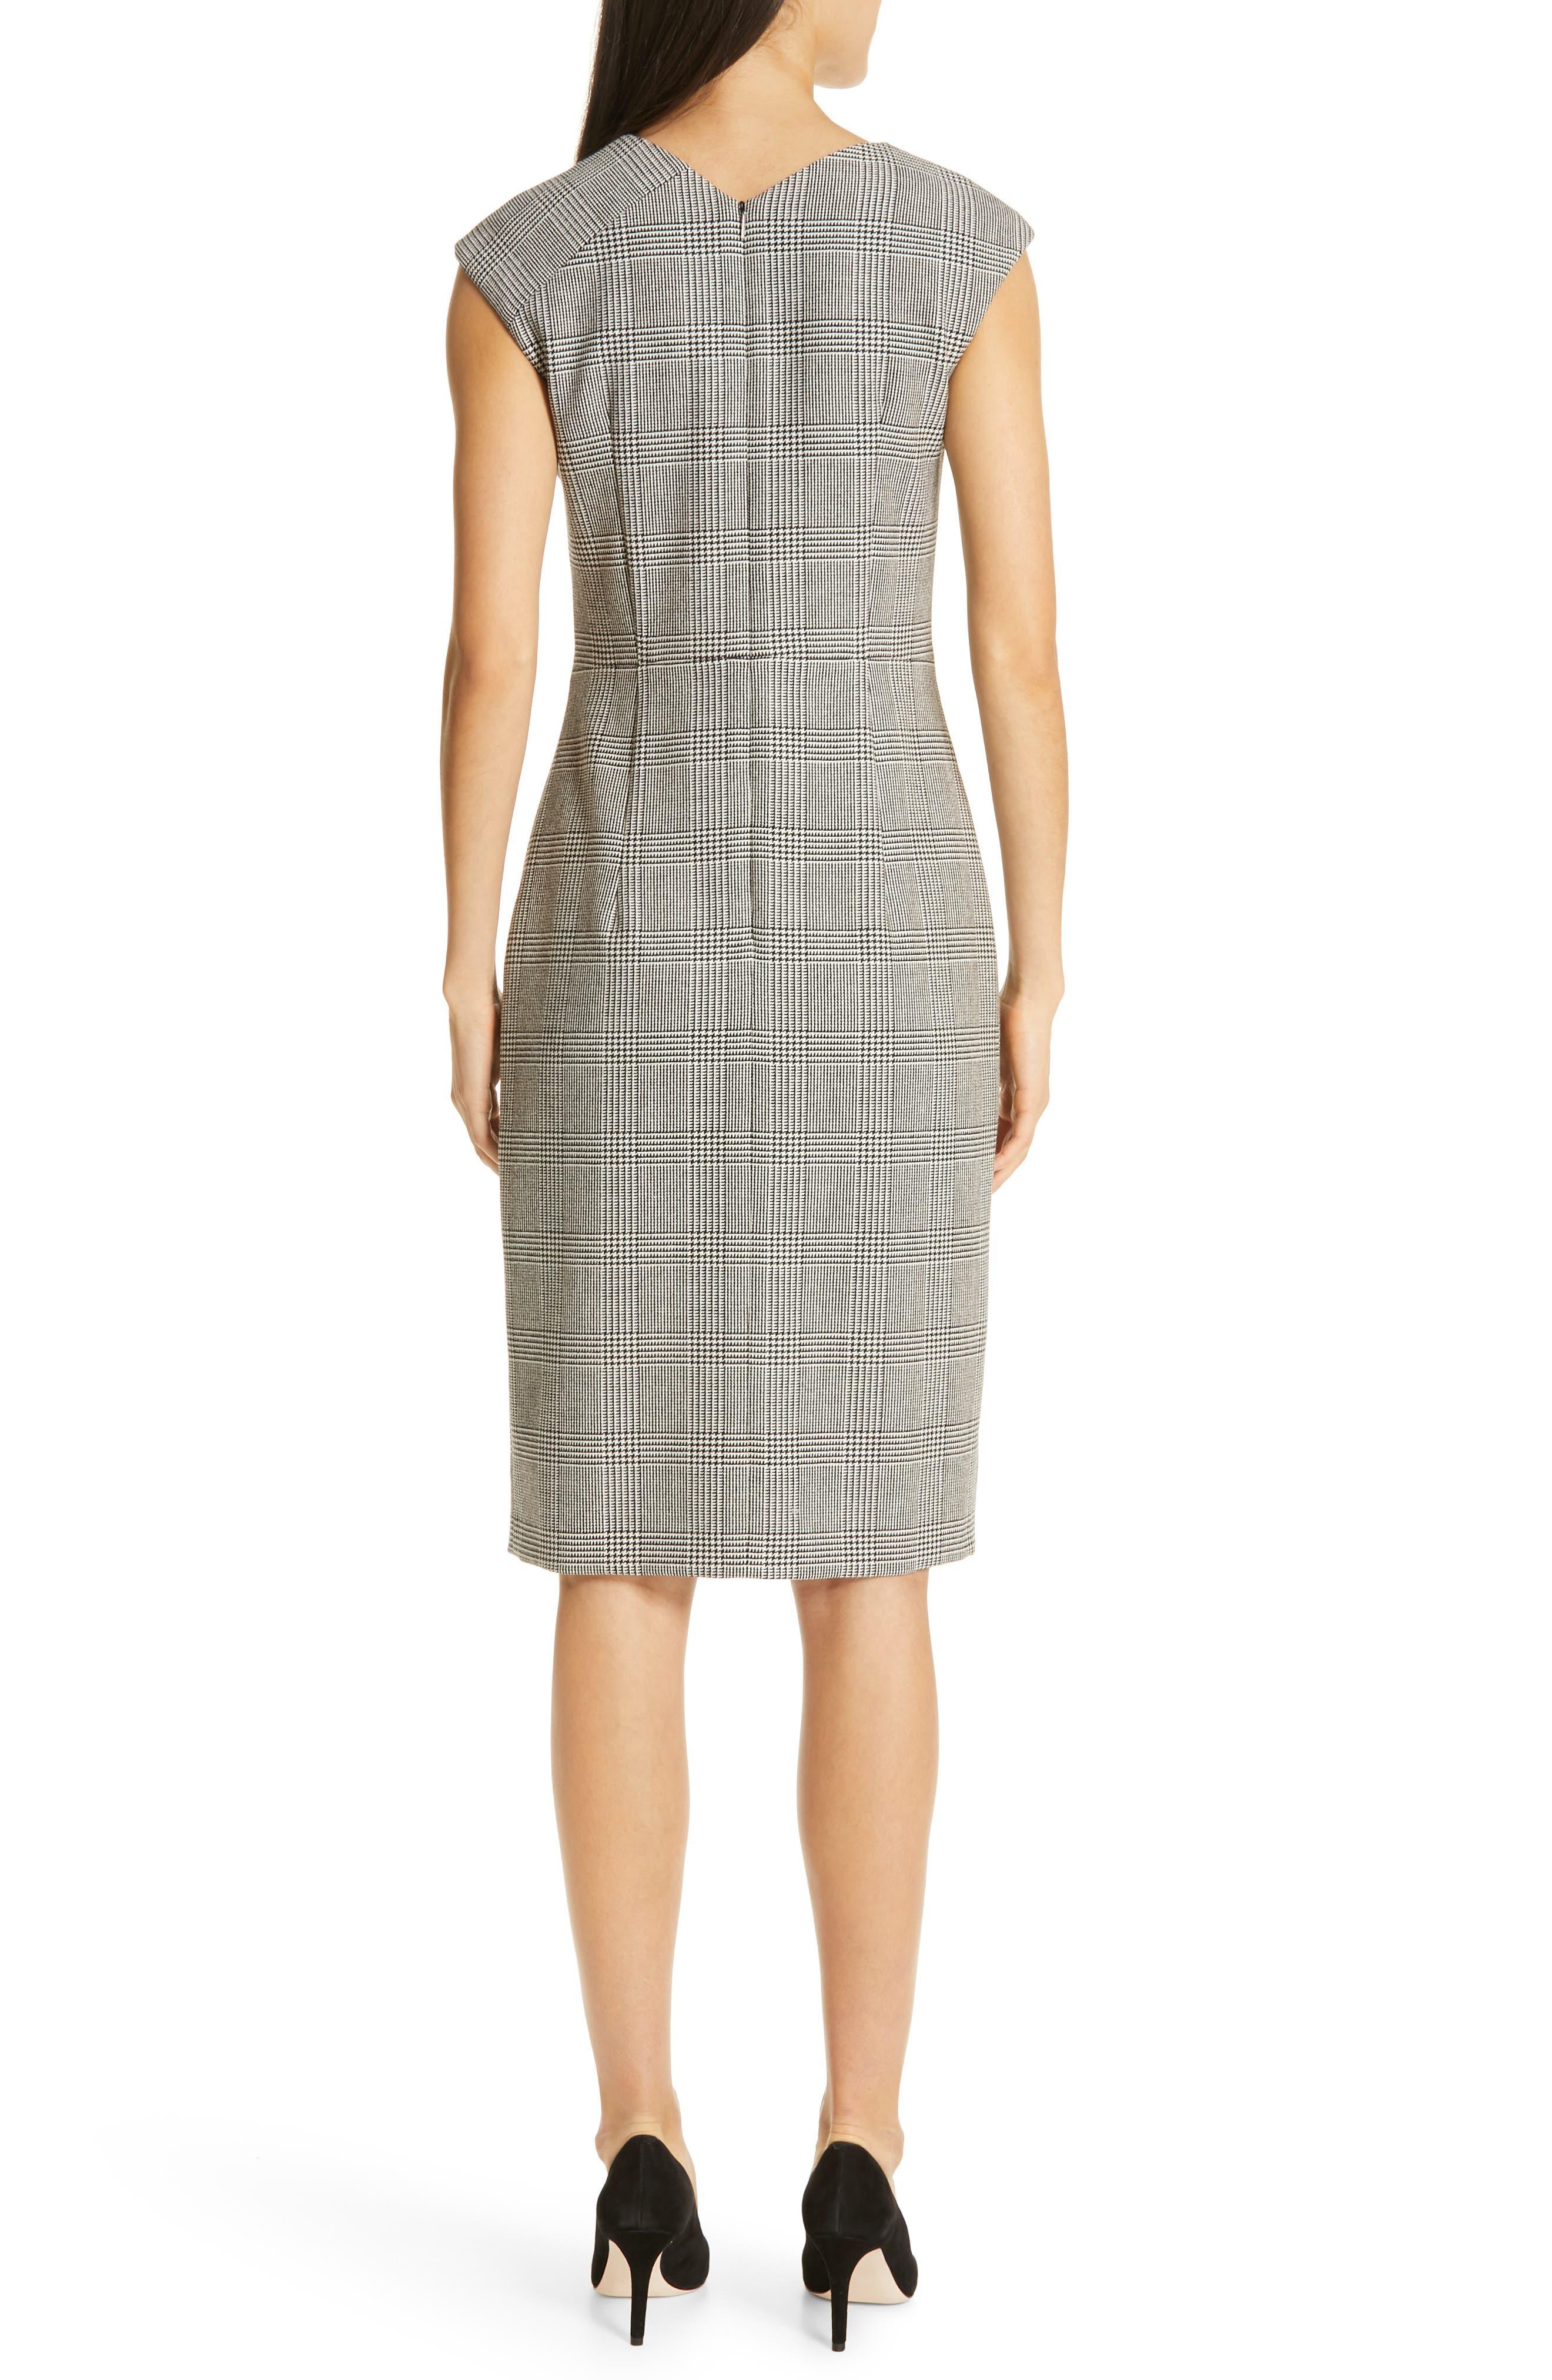 BOSS, Dechesta Glen Plaid Sheath Dress, Alternate thumbnail 2, color, 020